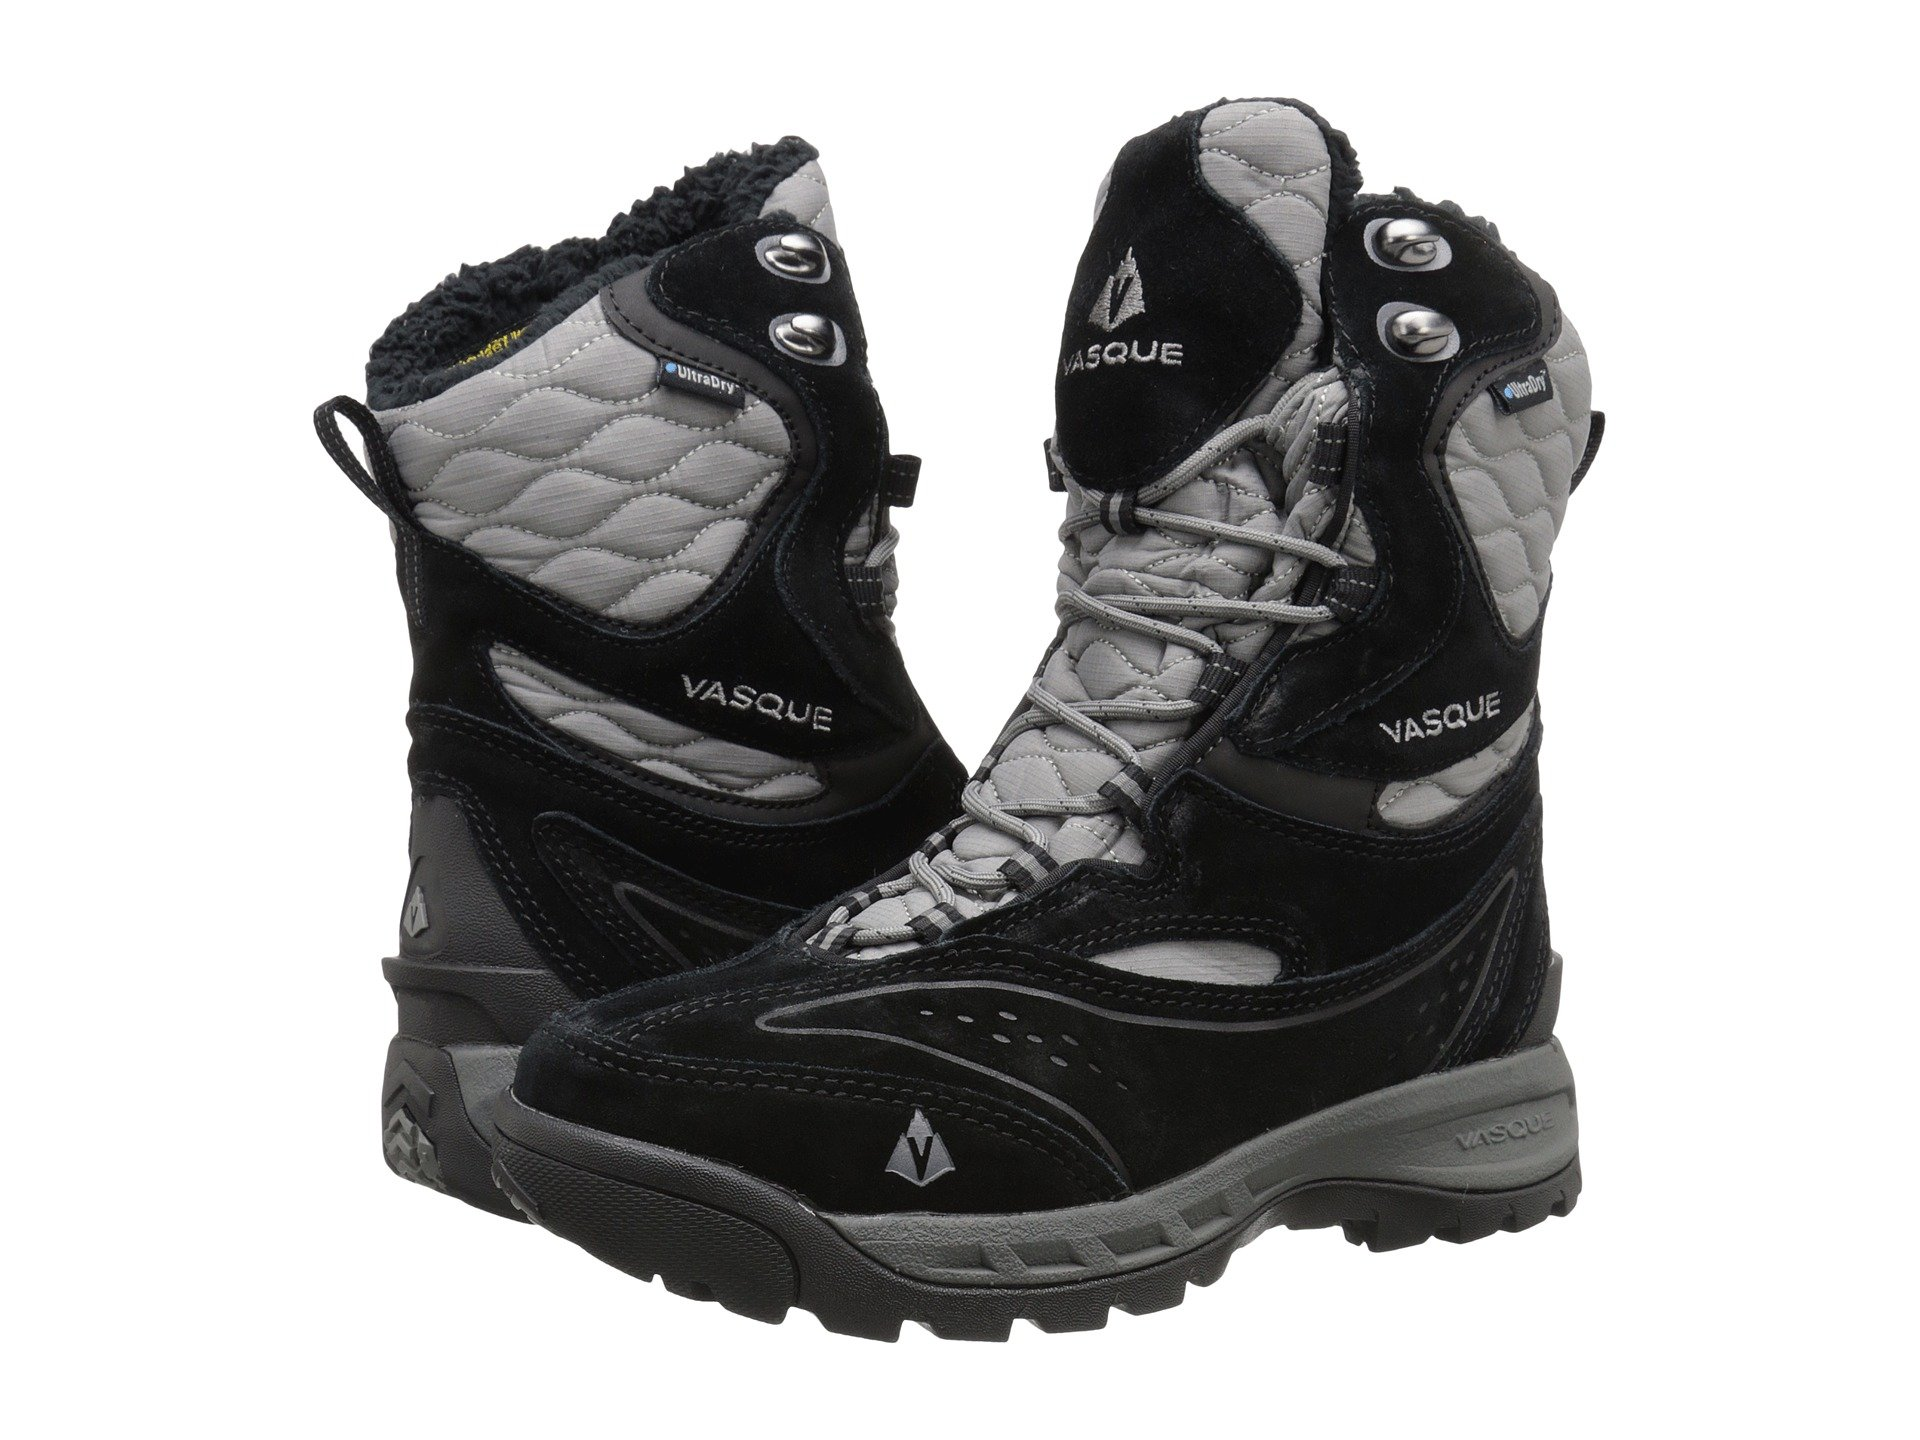 Vasque Women's Pow Pow II UltraDry Insulated Winter Boot, Black/Gargoyle,6 M US